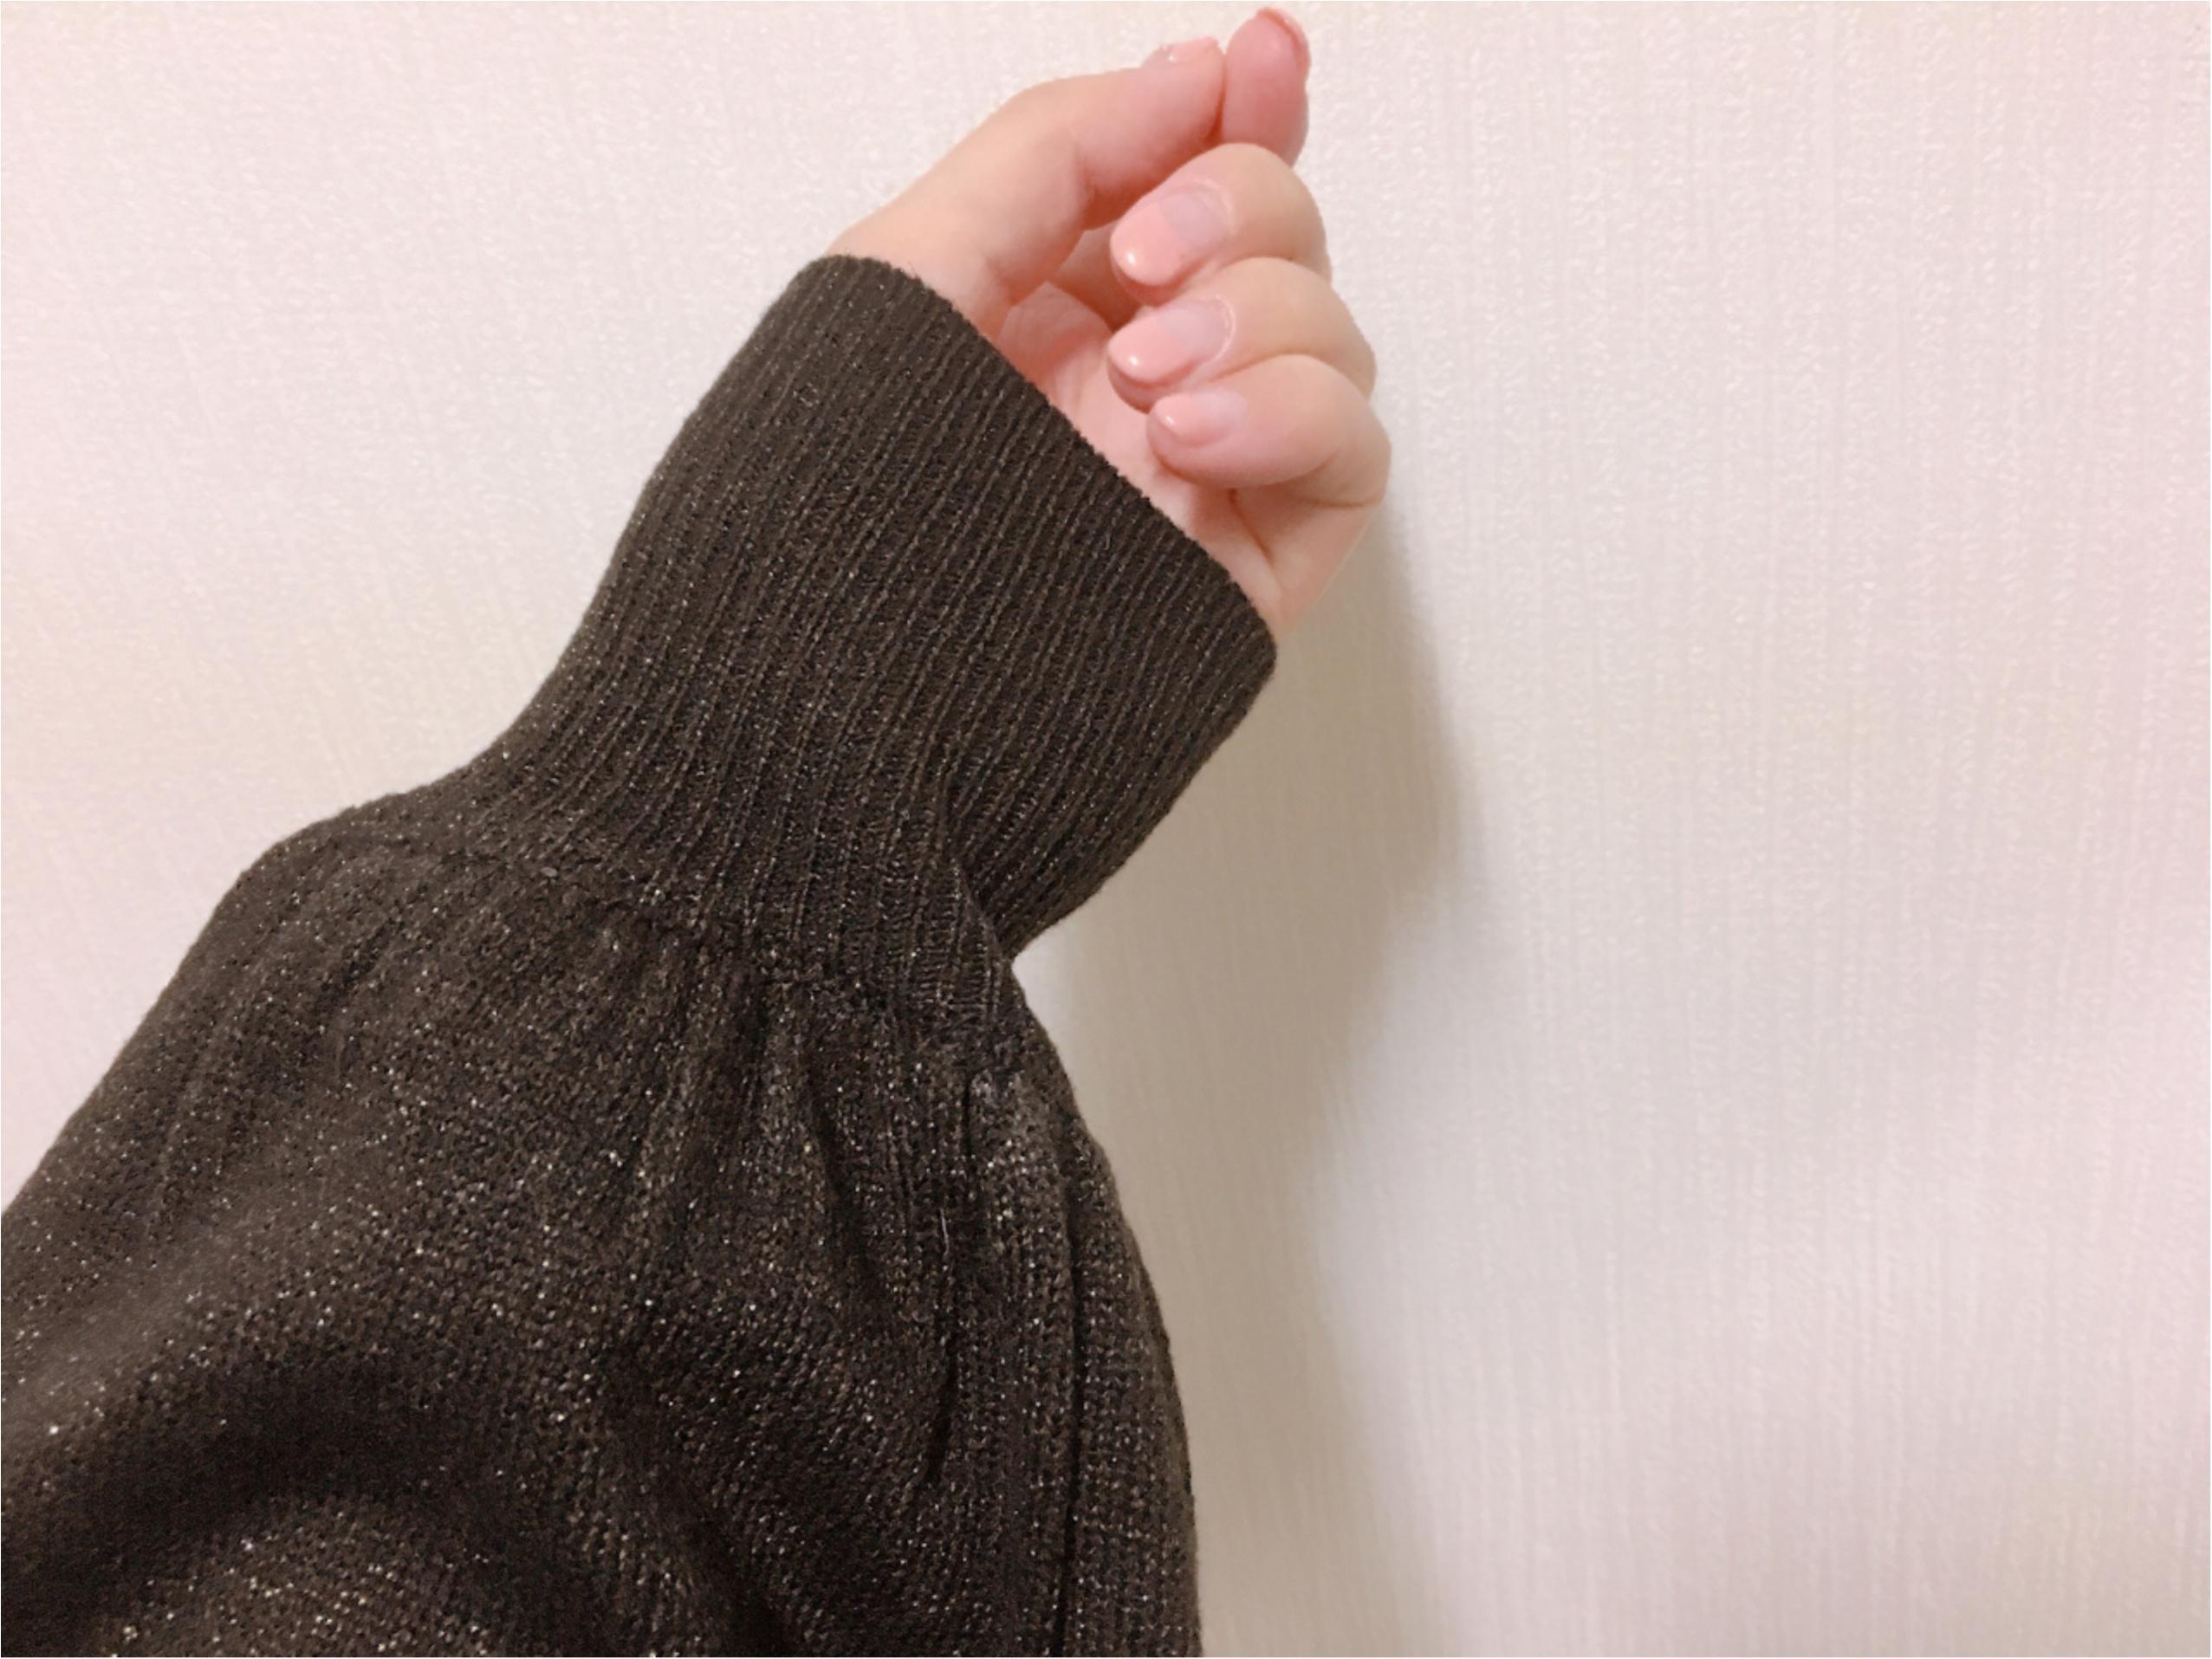 【GU】『ラメパフスリーブセーター』は、あまり取り上げられていない隠れヒット服!_4